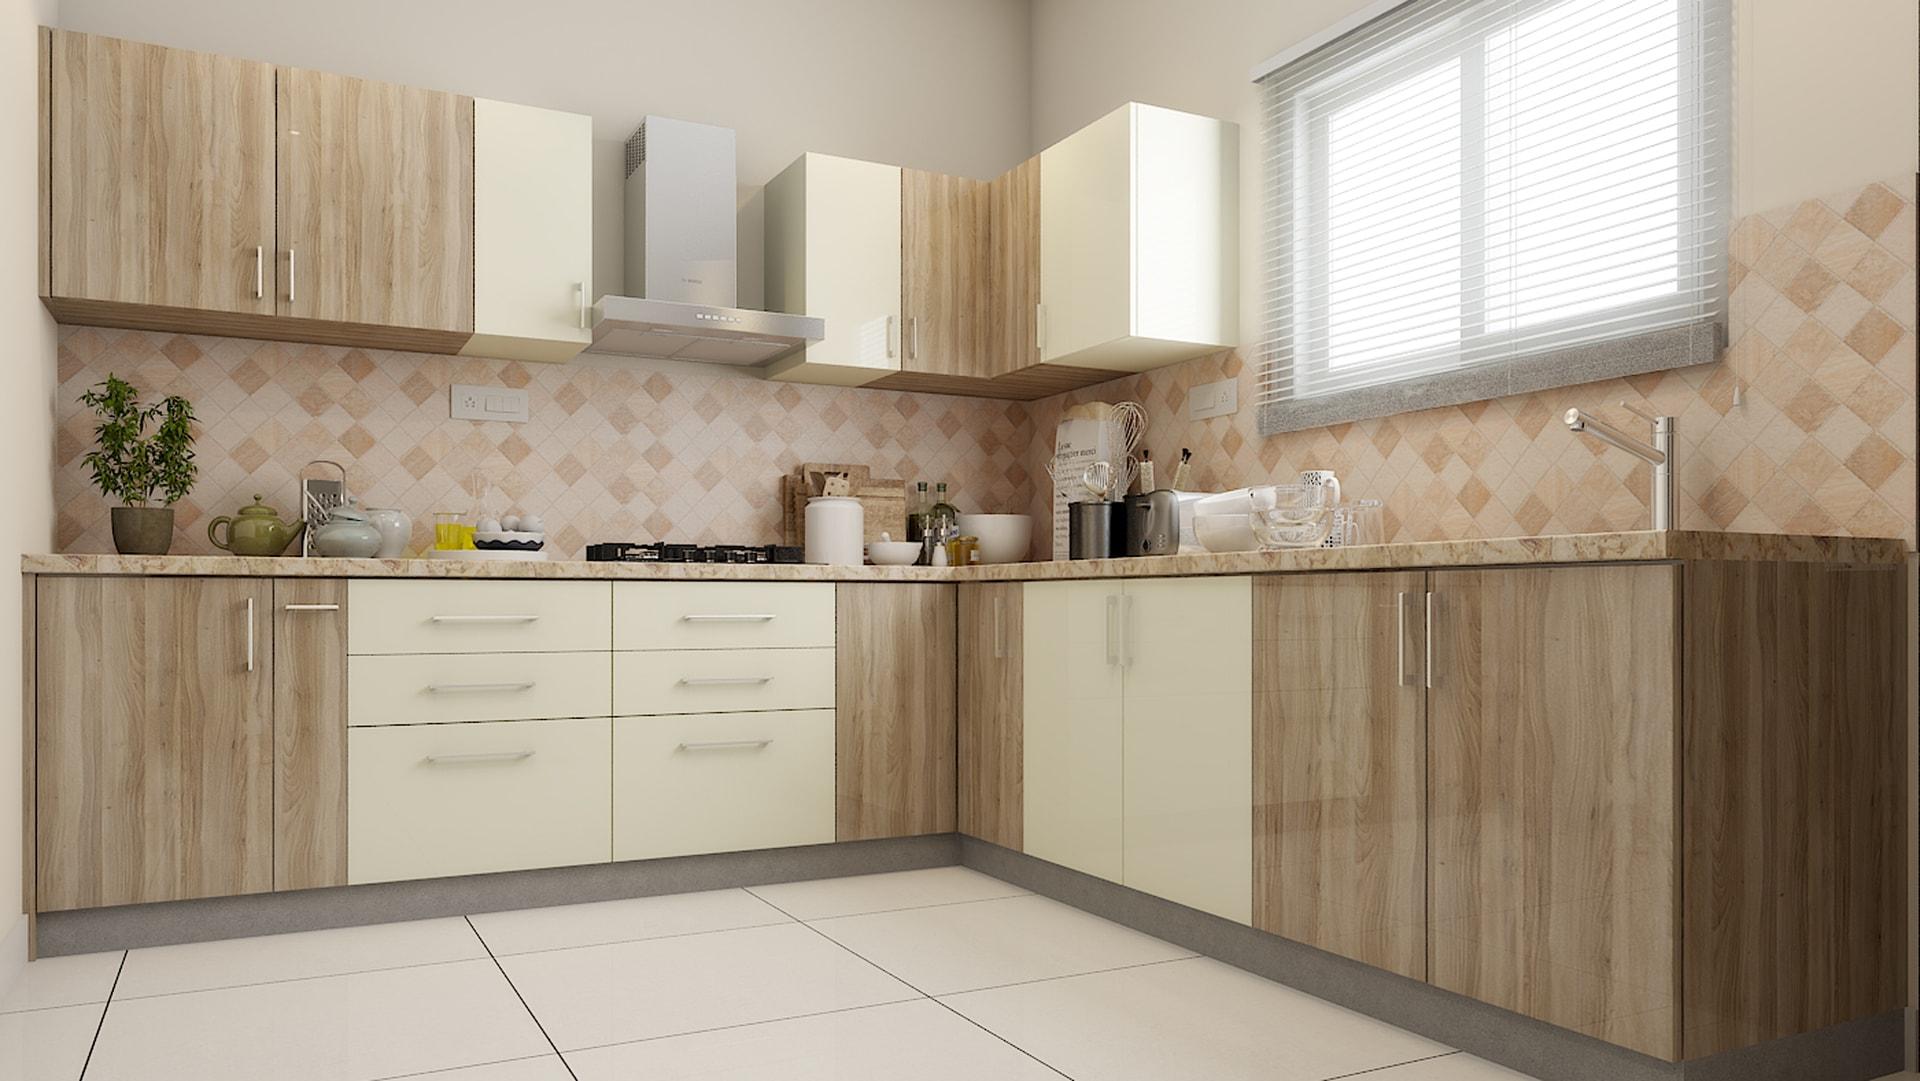 L-Shaped Modular Kitchen Designs